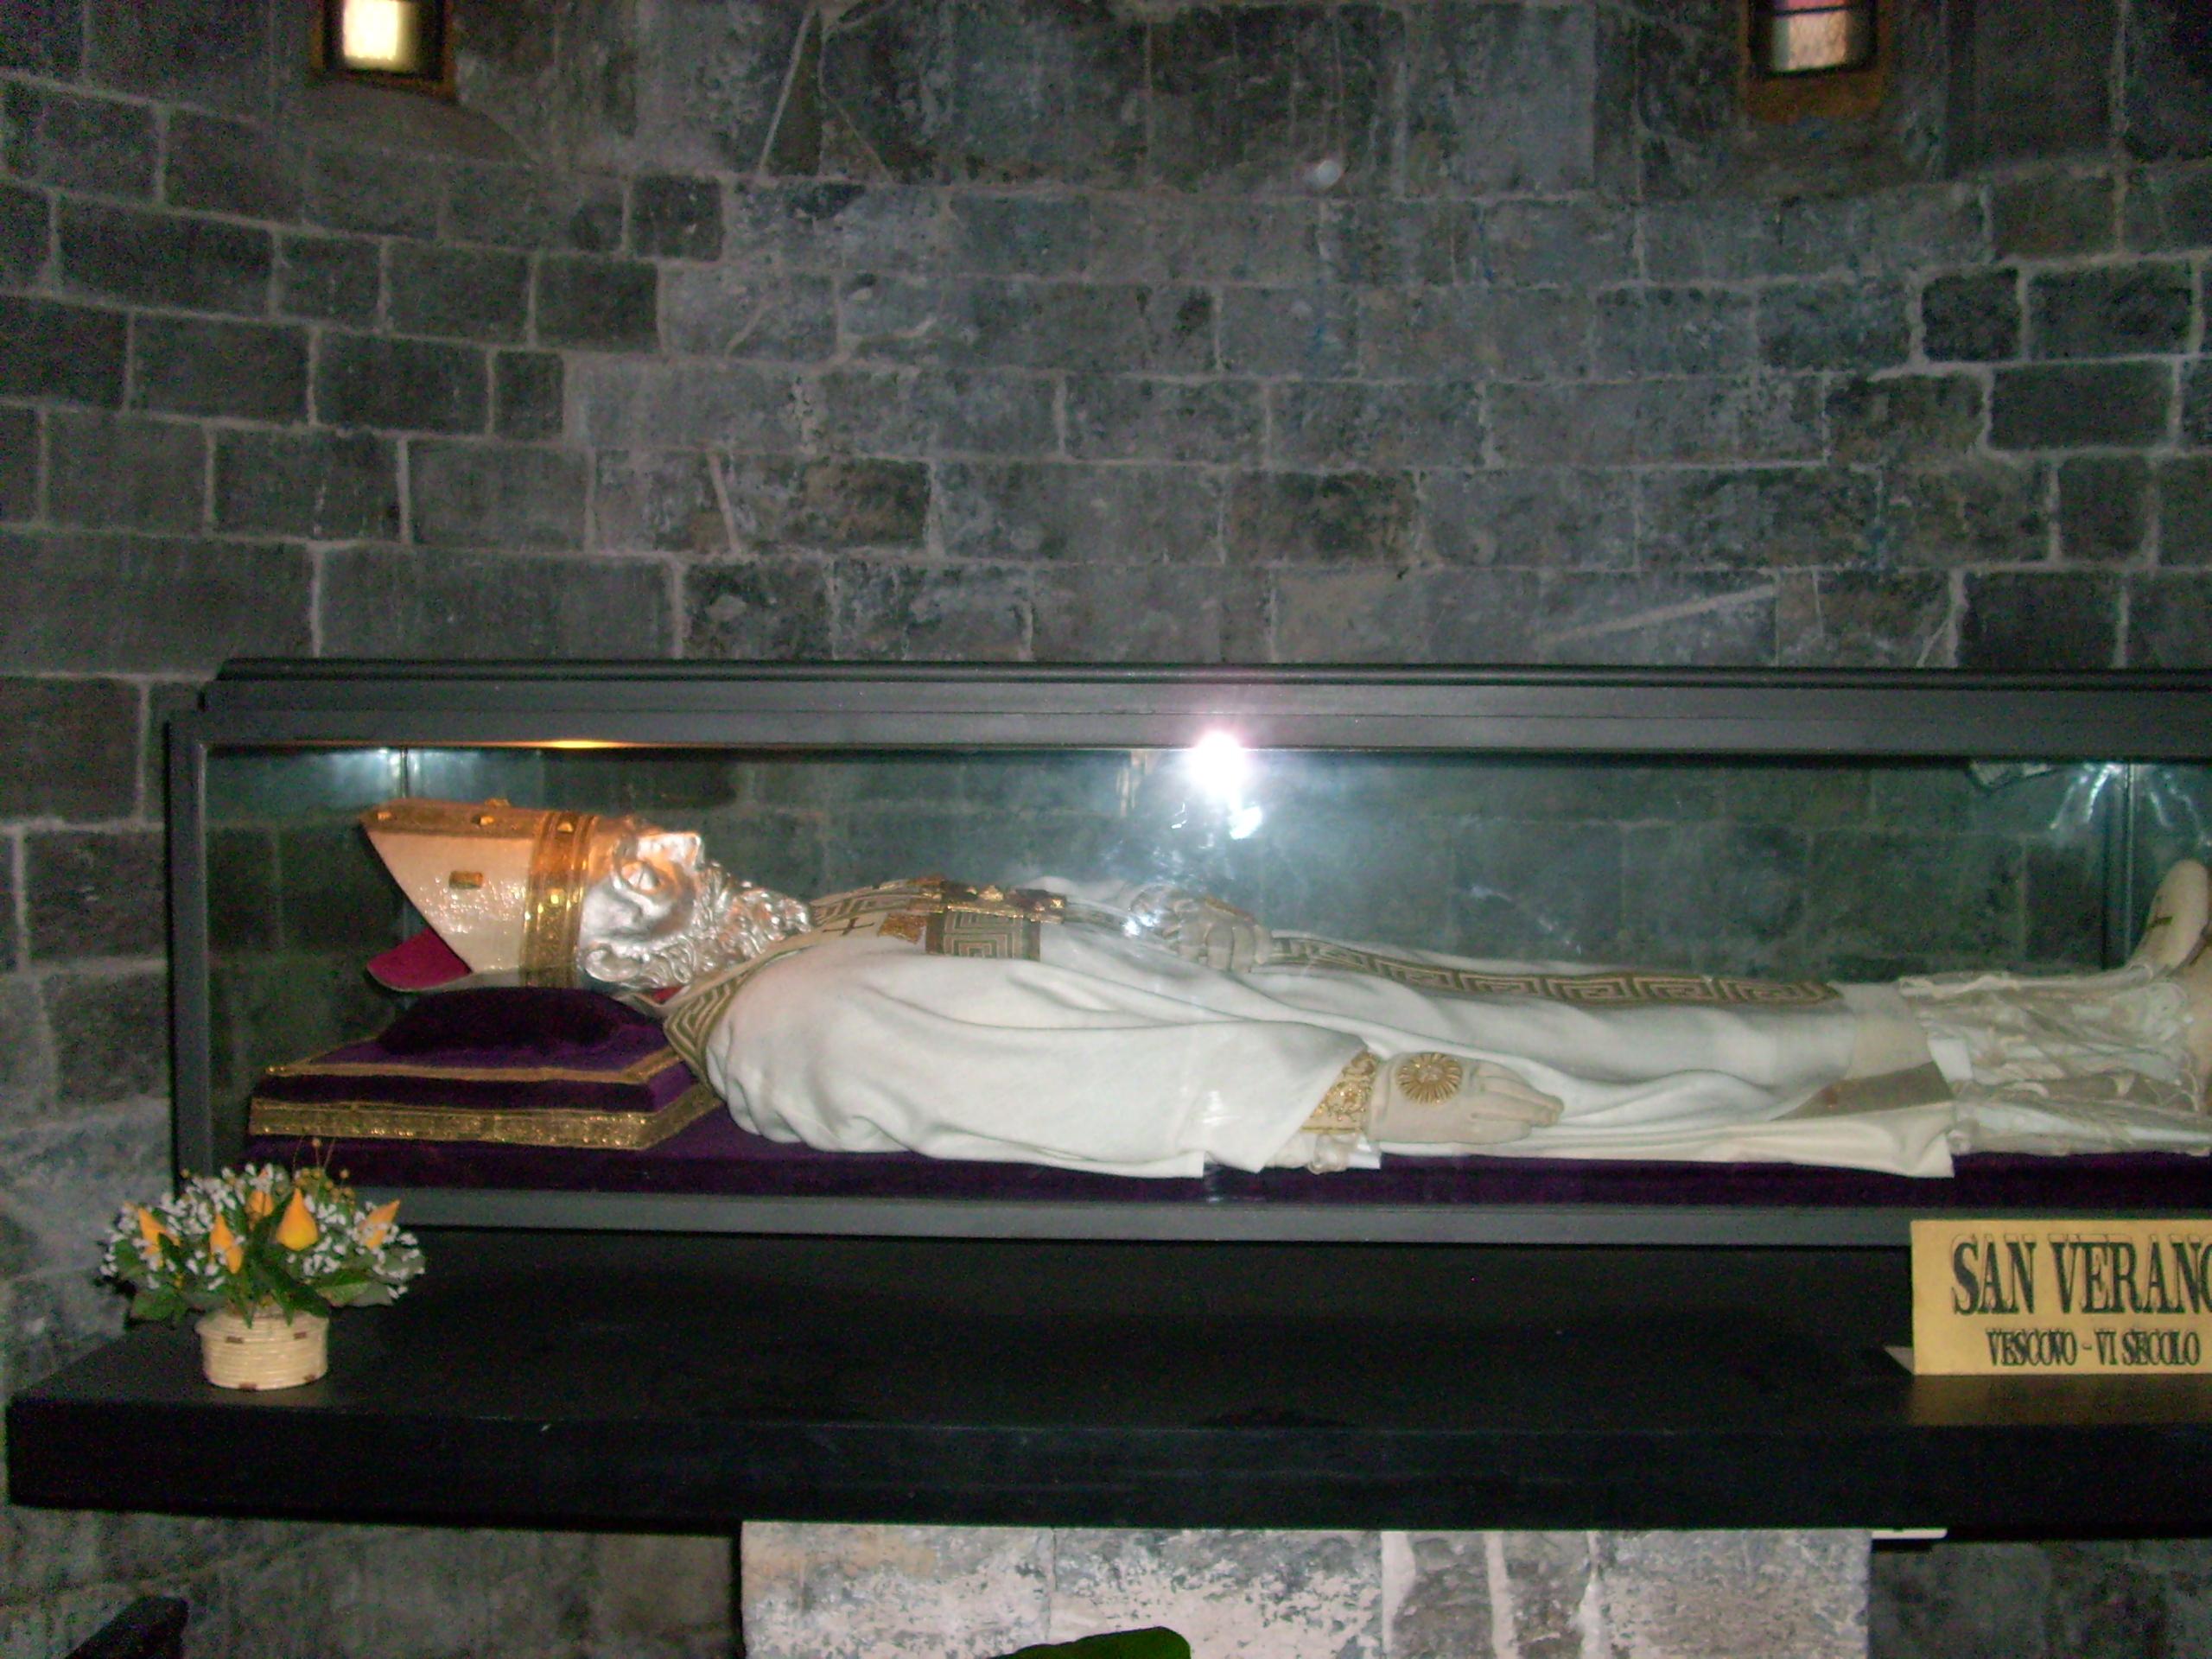 Veranus' ikledde relikvier i katedralen San Michele Arcangelo i Albenga i Liguria i Italia